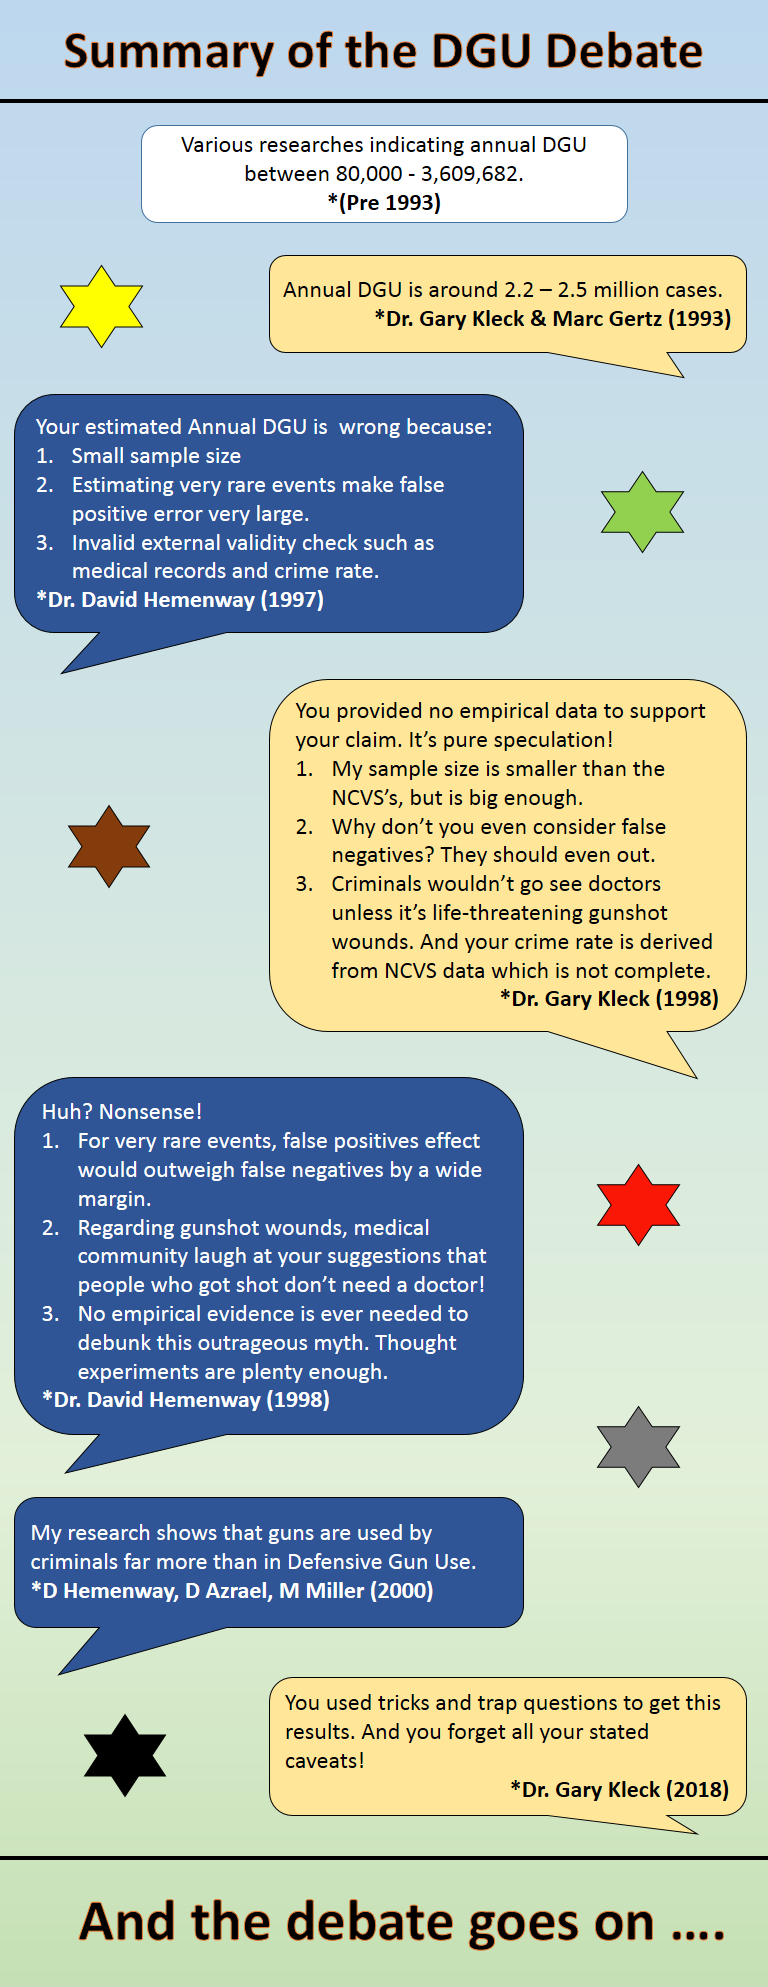 DGU summary infographic